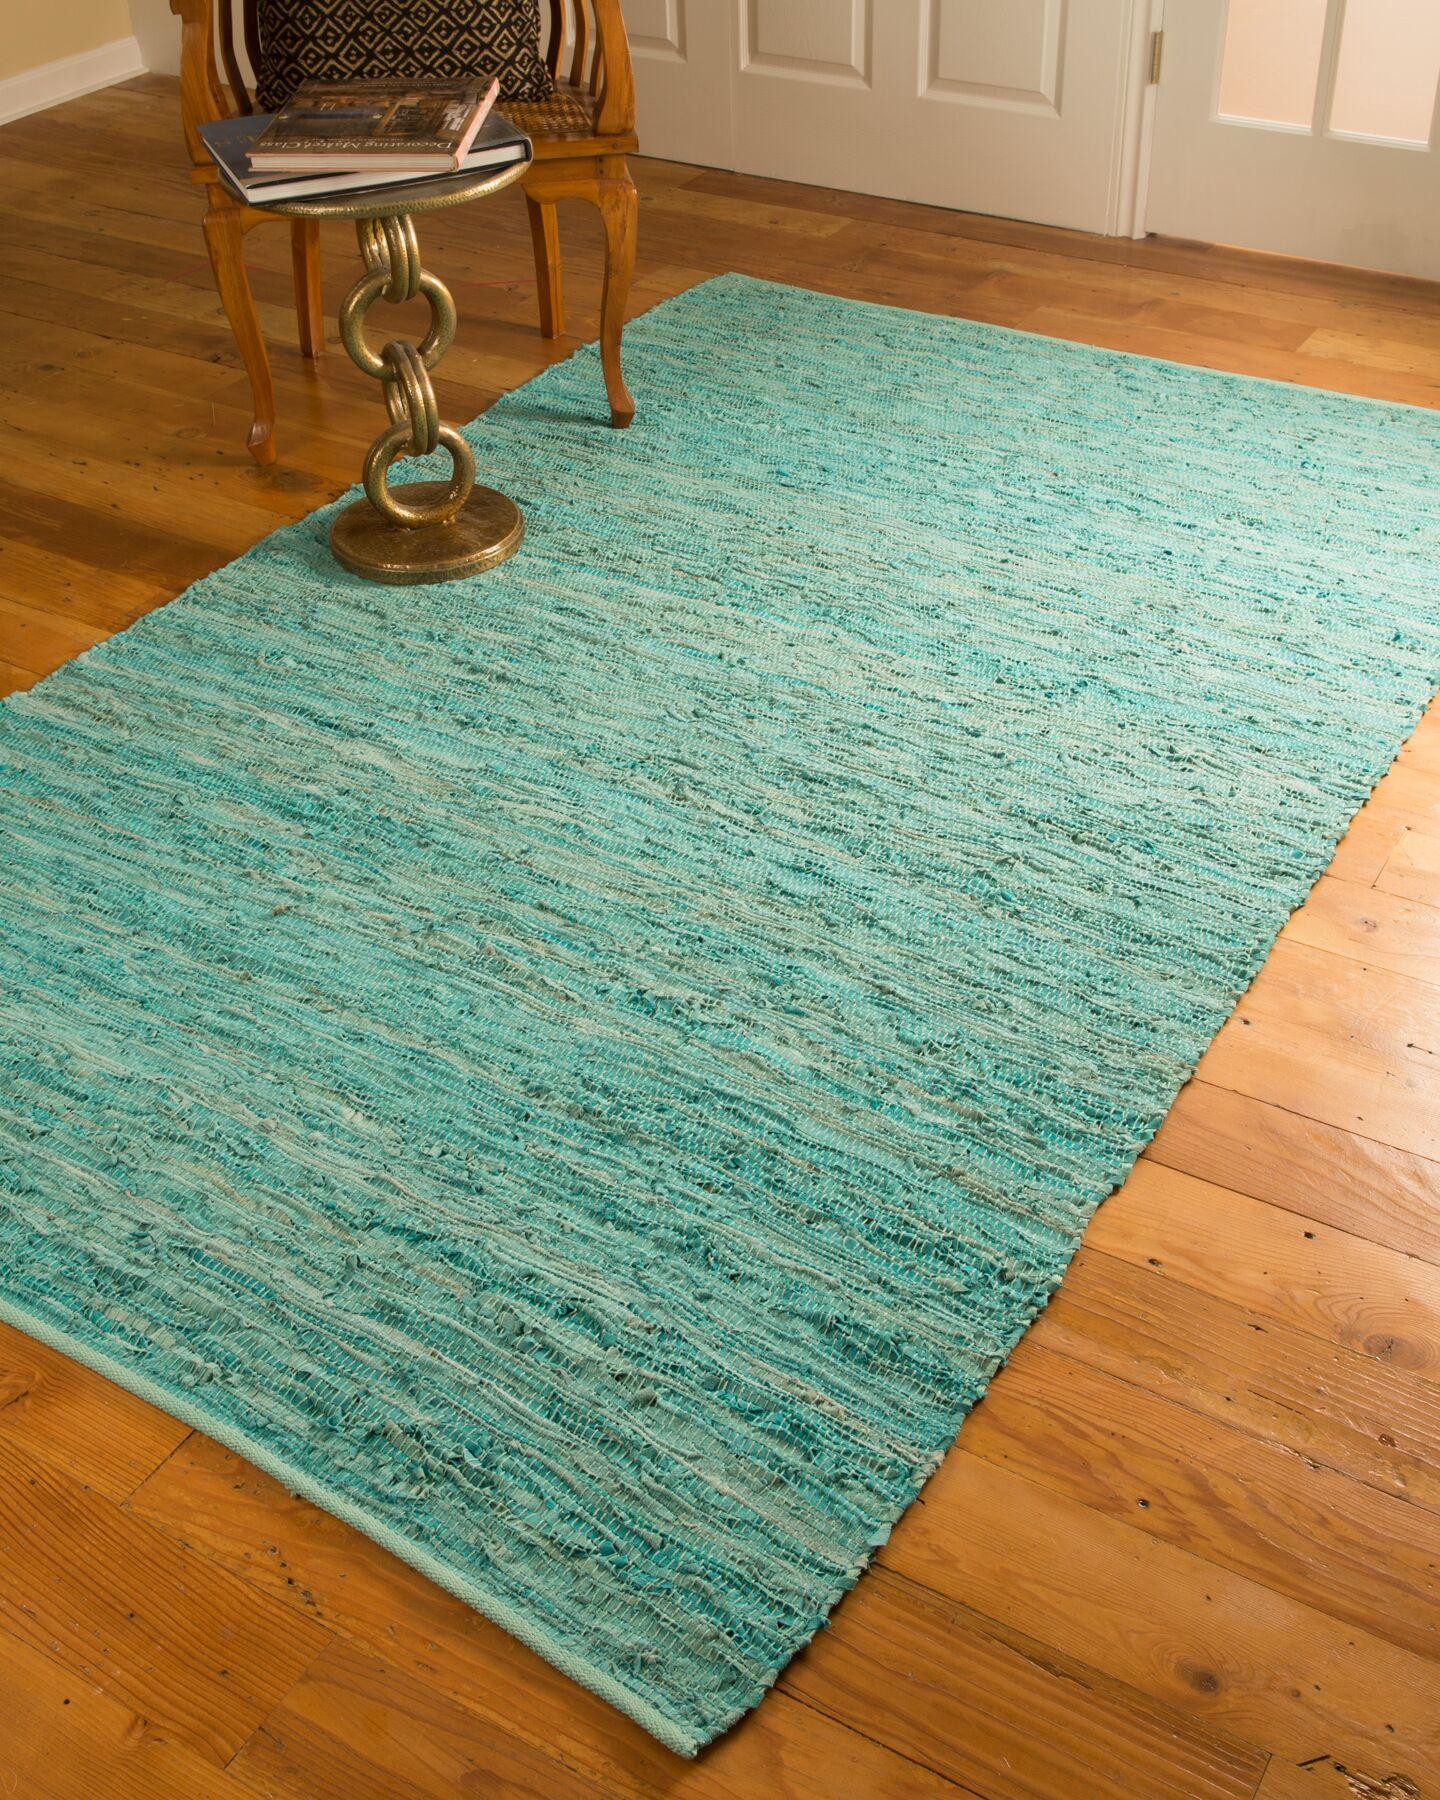 Barras Green Area Rug Rug Size: Rectangle 5' x 8'